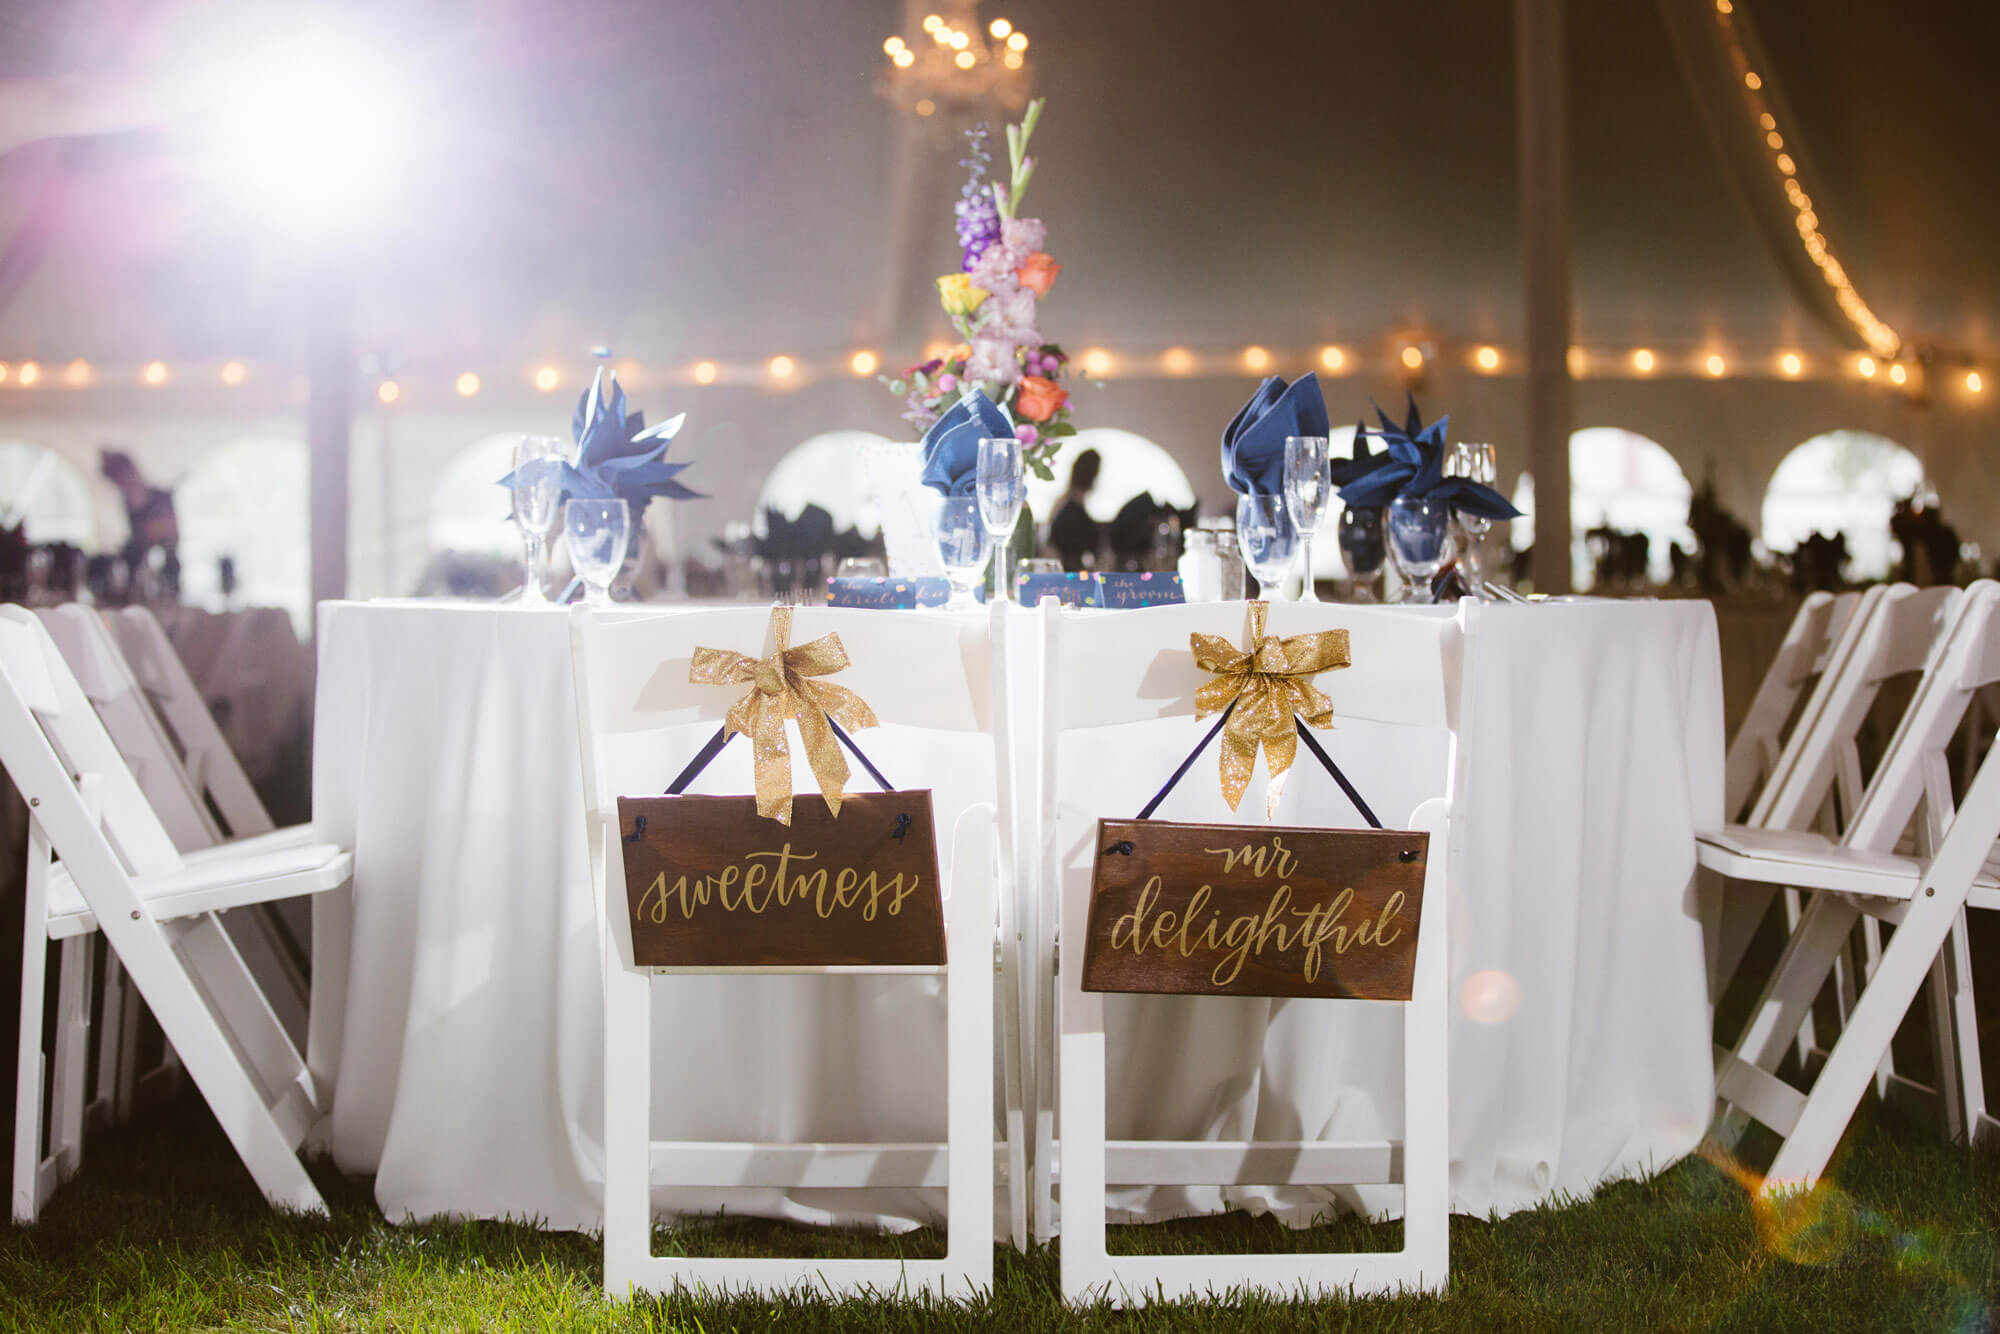 Erica-Kay-Photography---Kate-_-Joe-Wedding-33.jpg